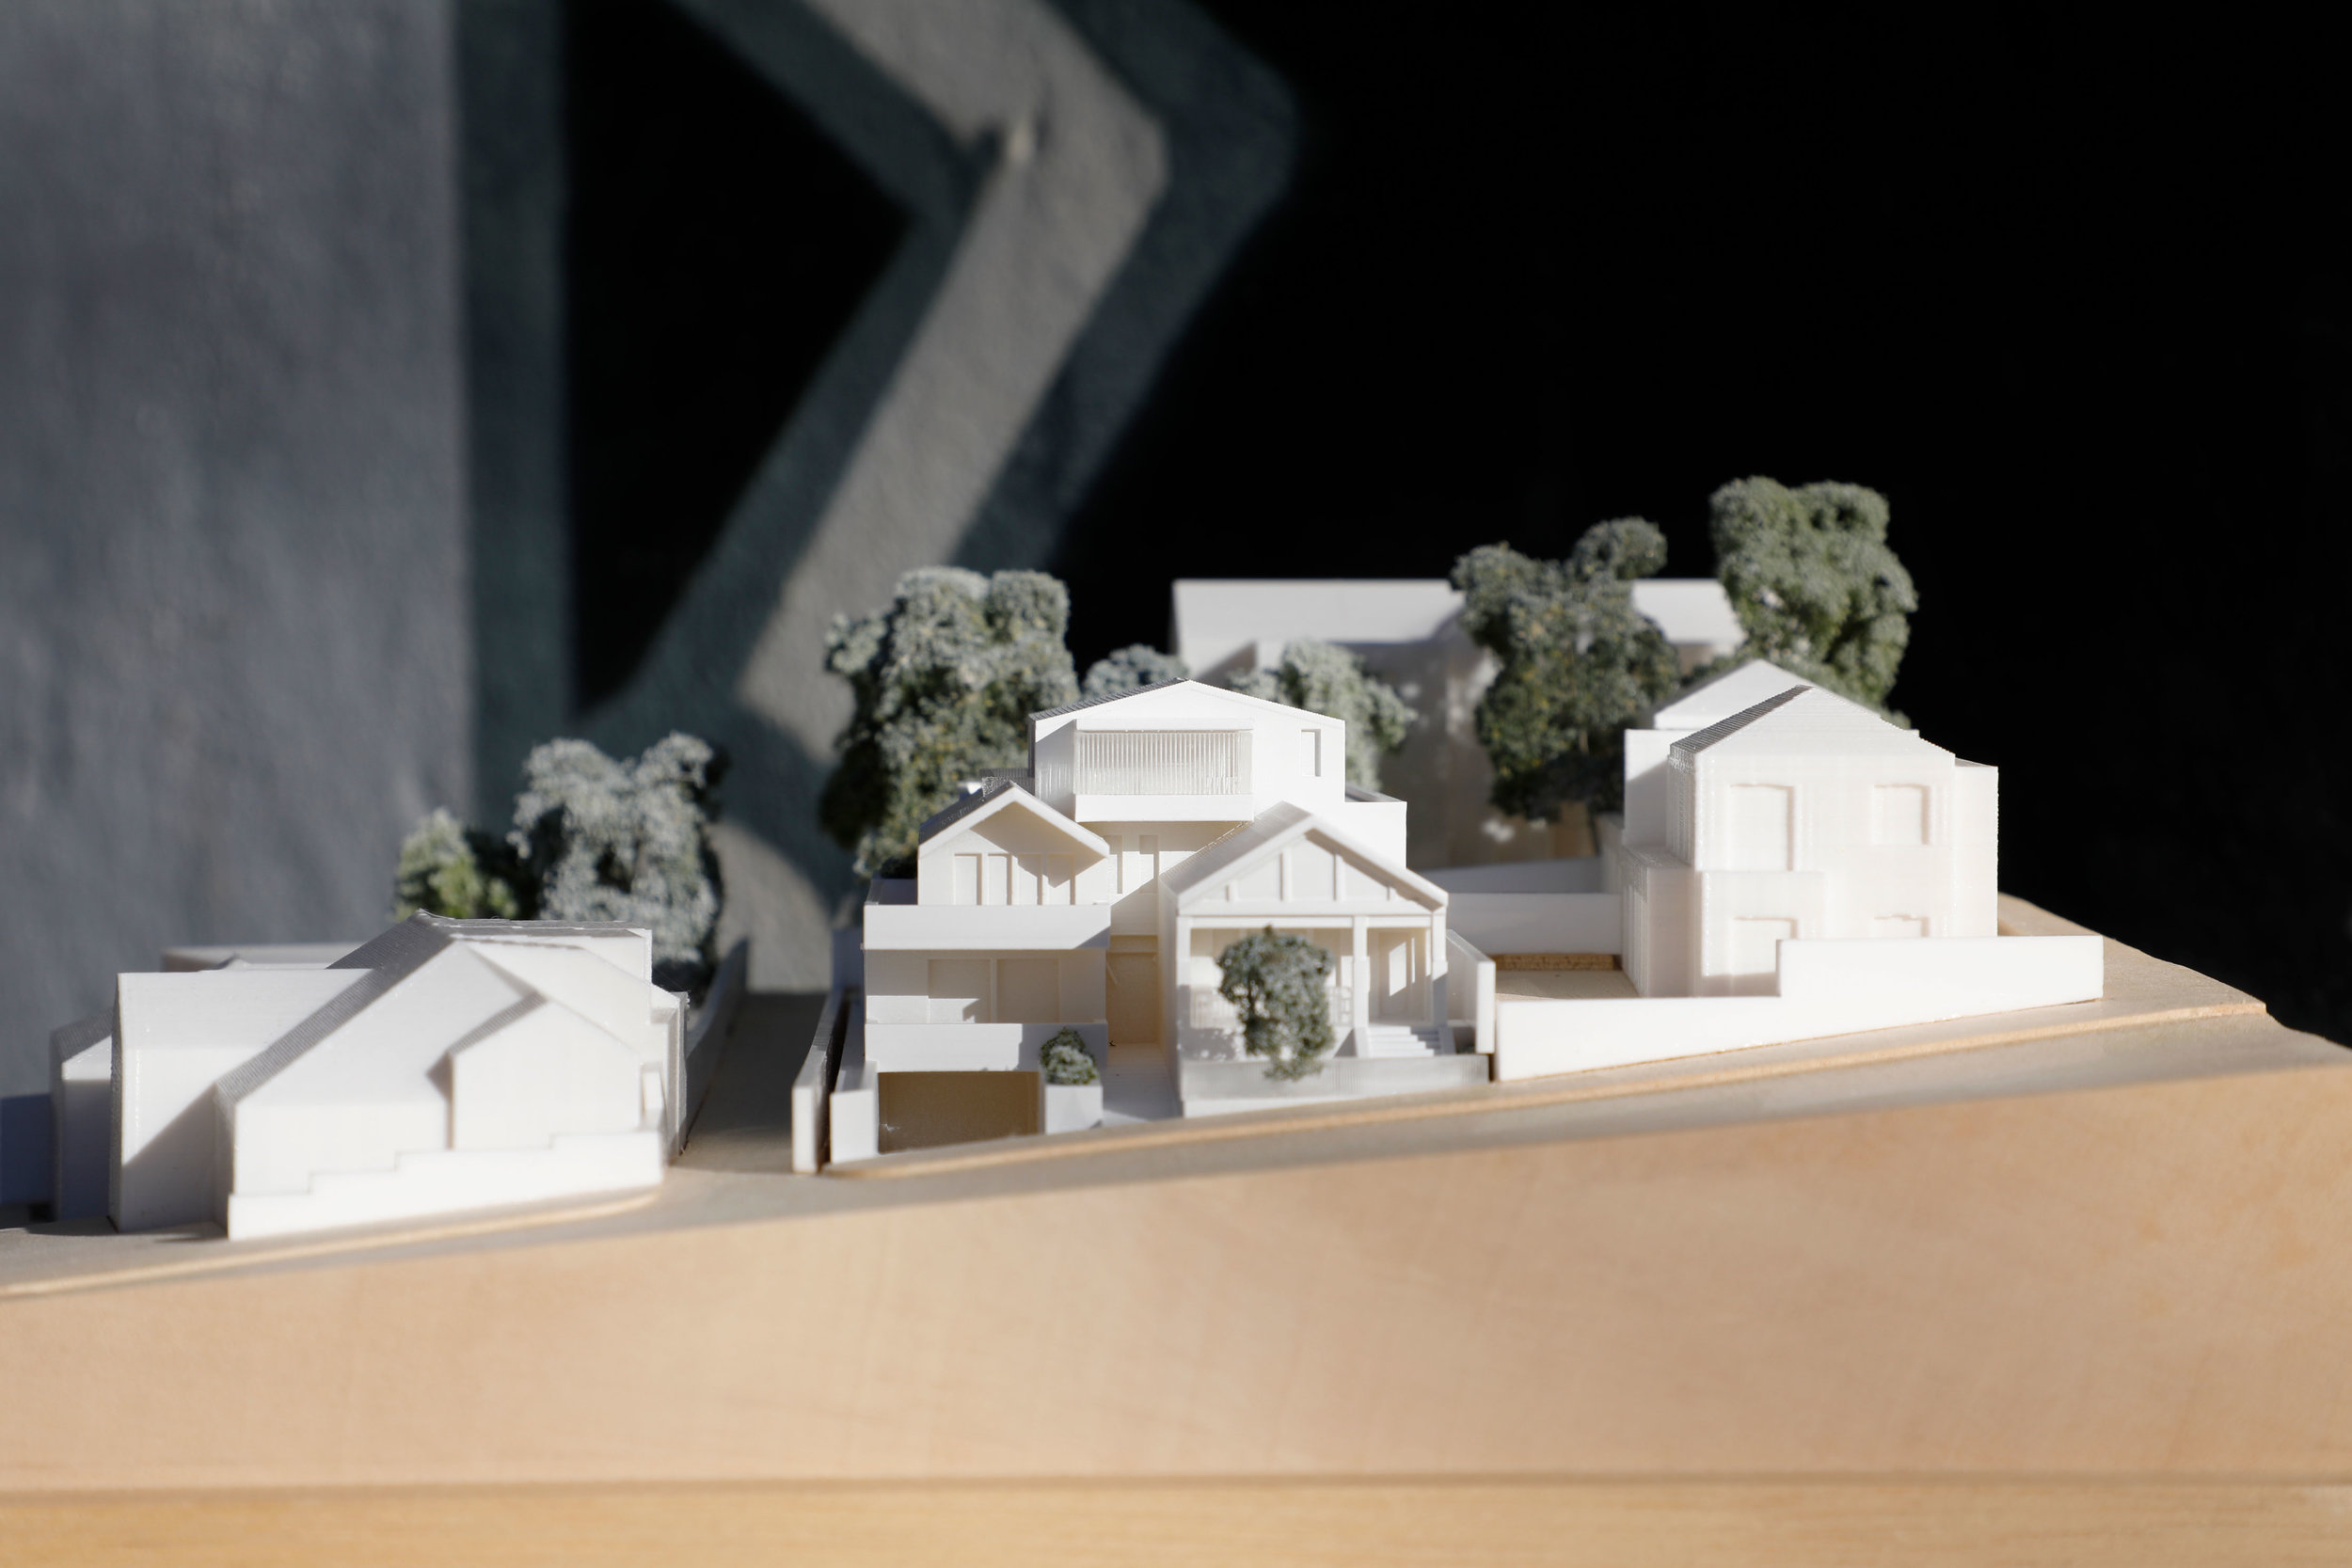 DA Model Woollahra Council 1:200